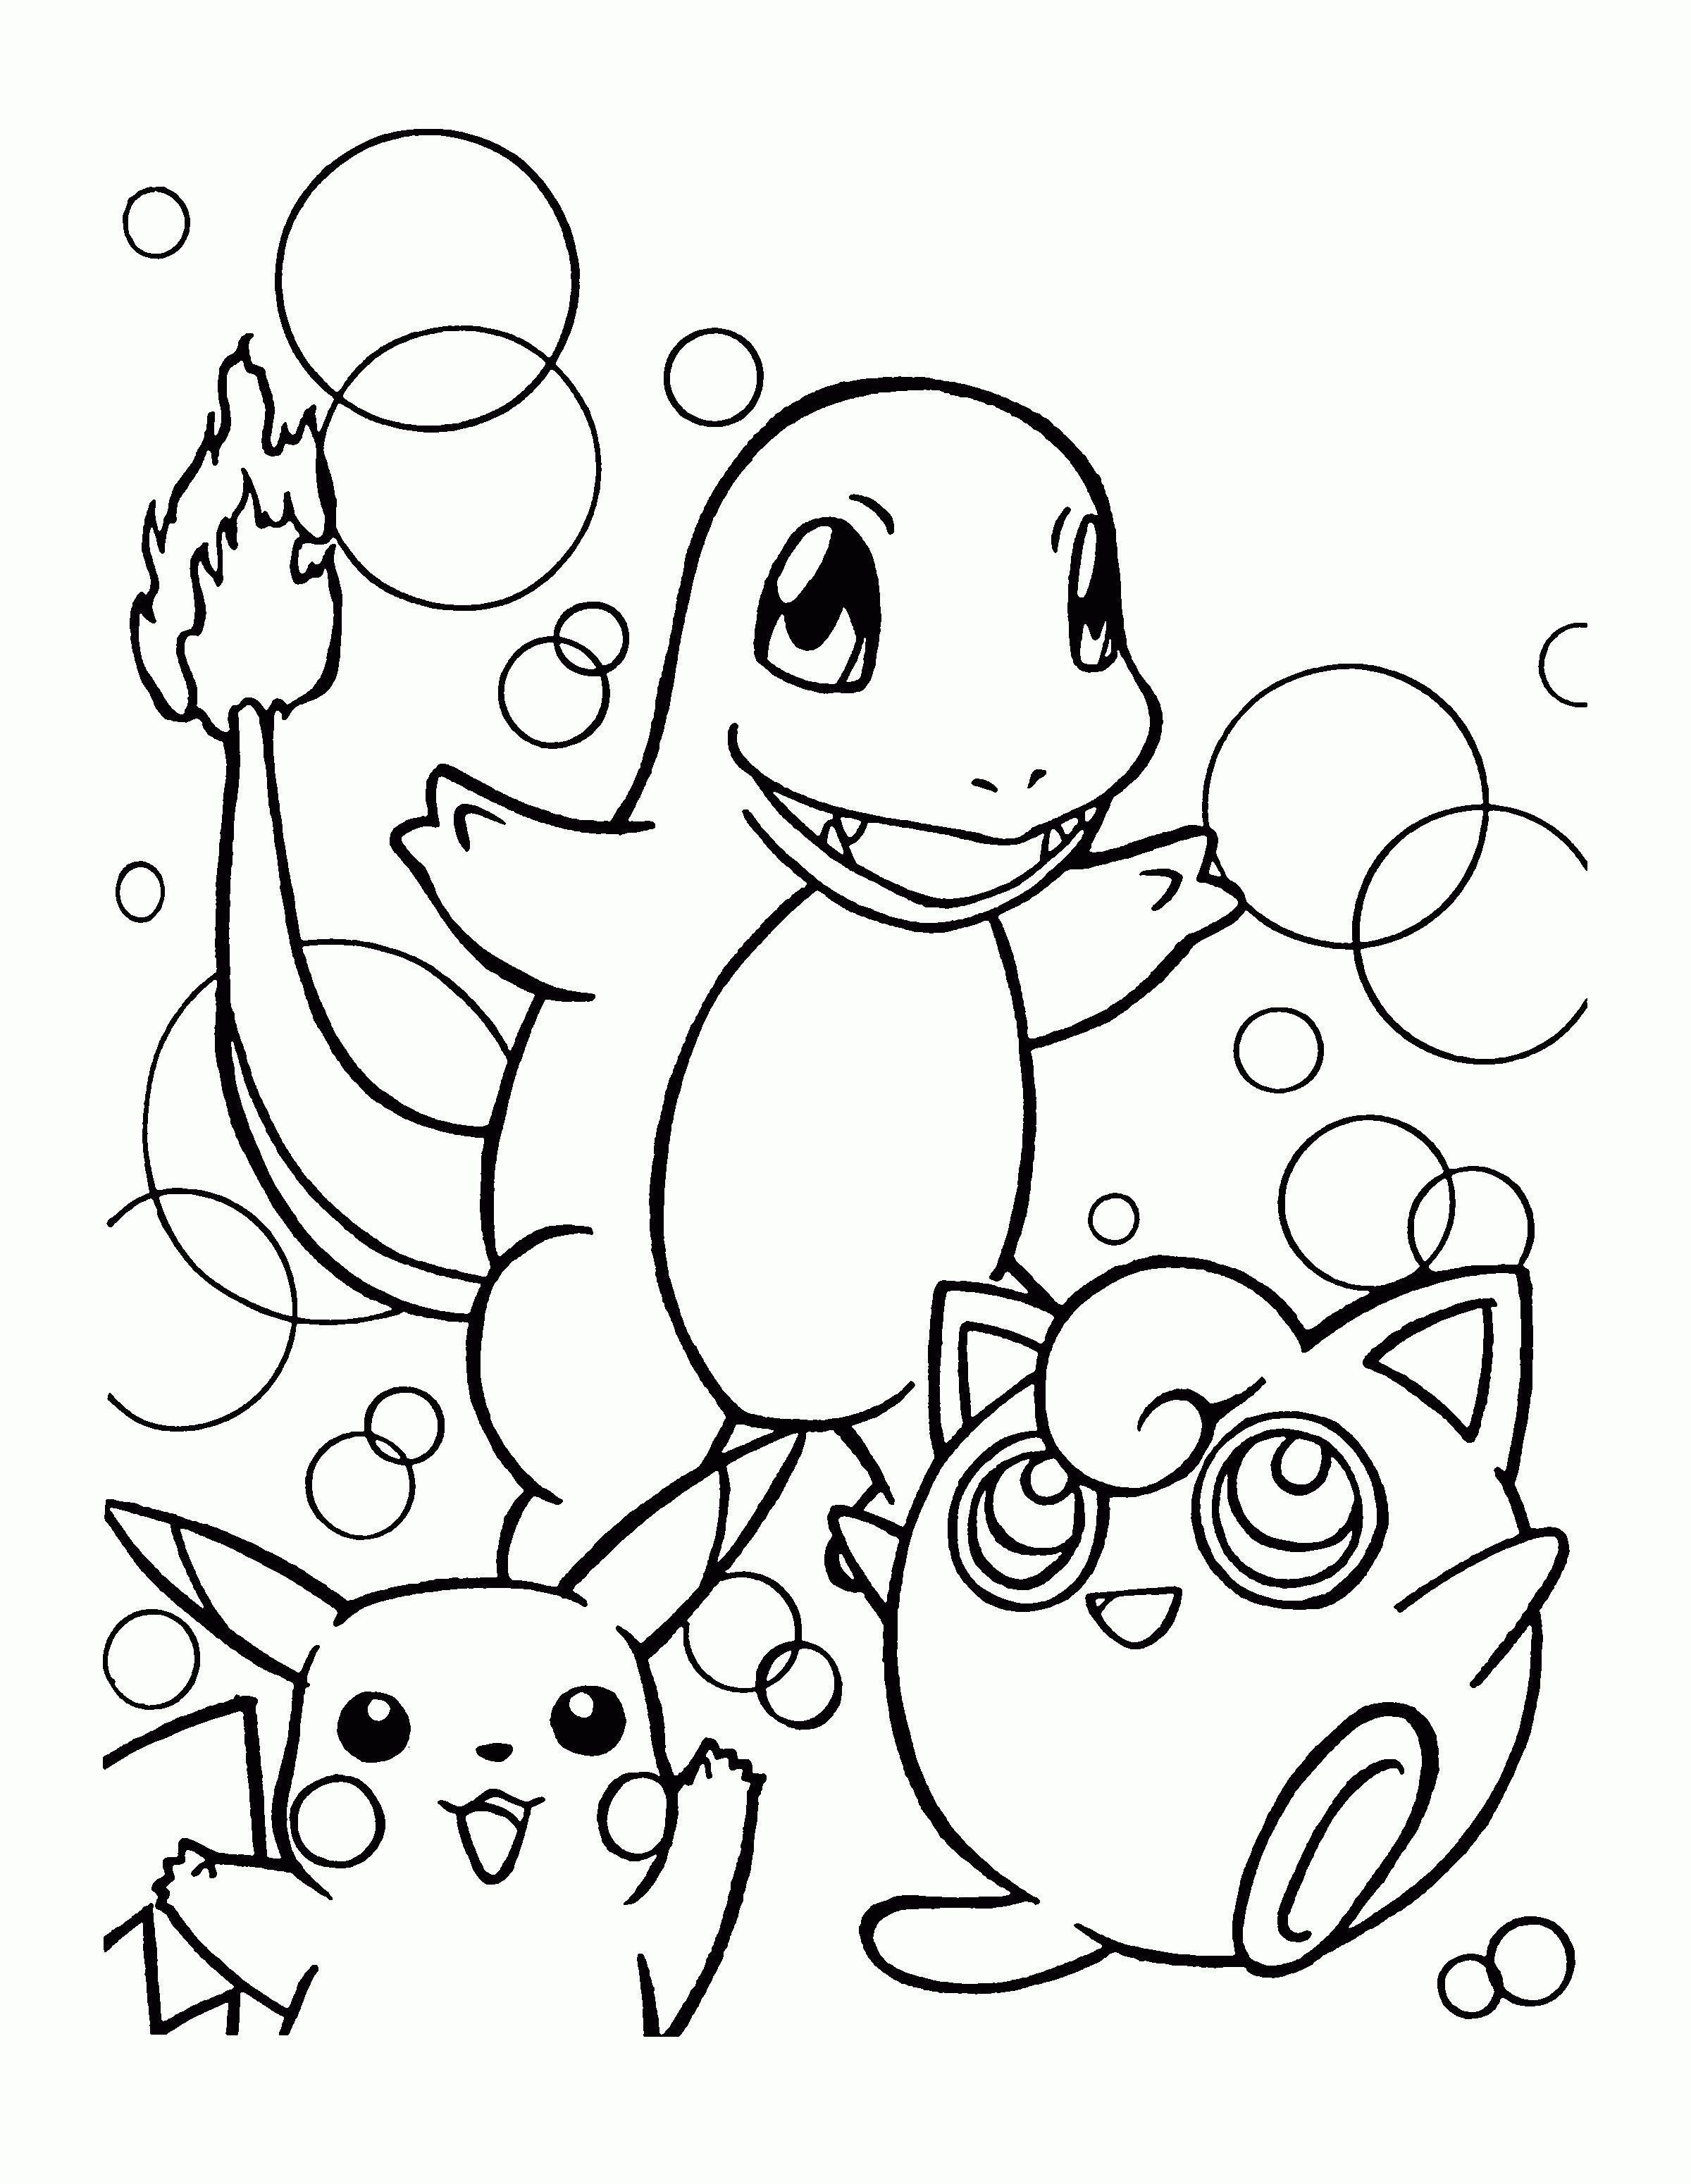 Pokemons kleurplaten charmander